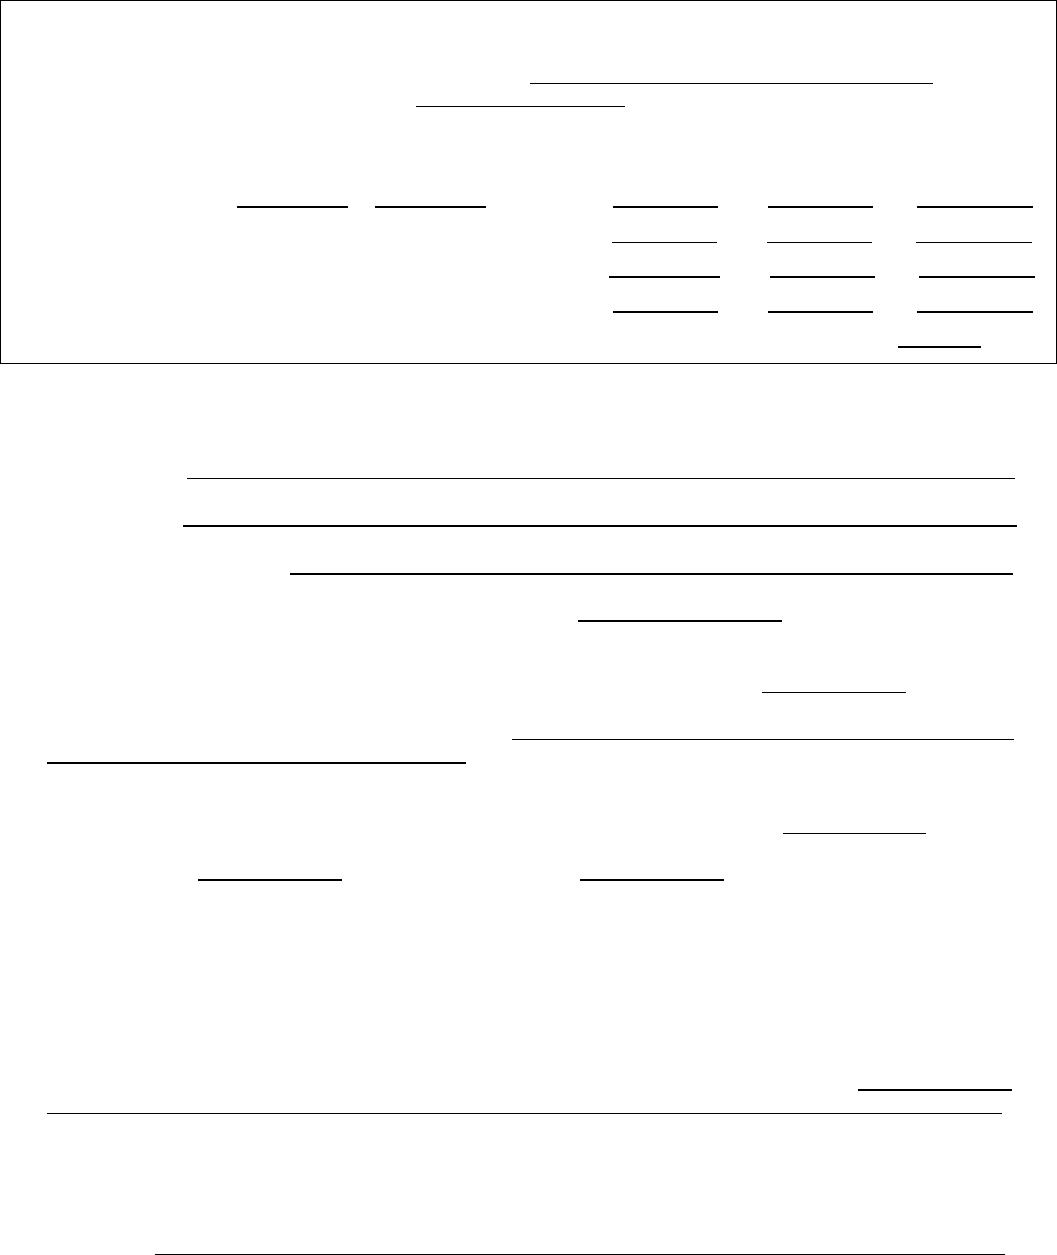 Free Utah Month To Month Rental Agreement Pdf 132kb 5 Pages